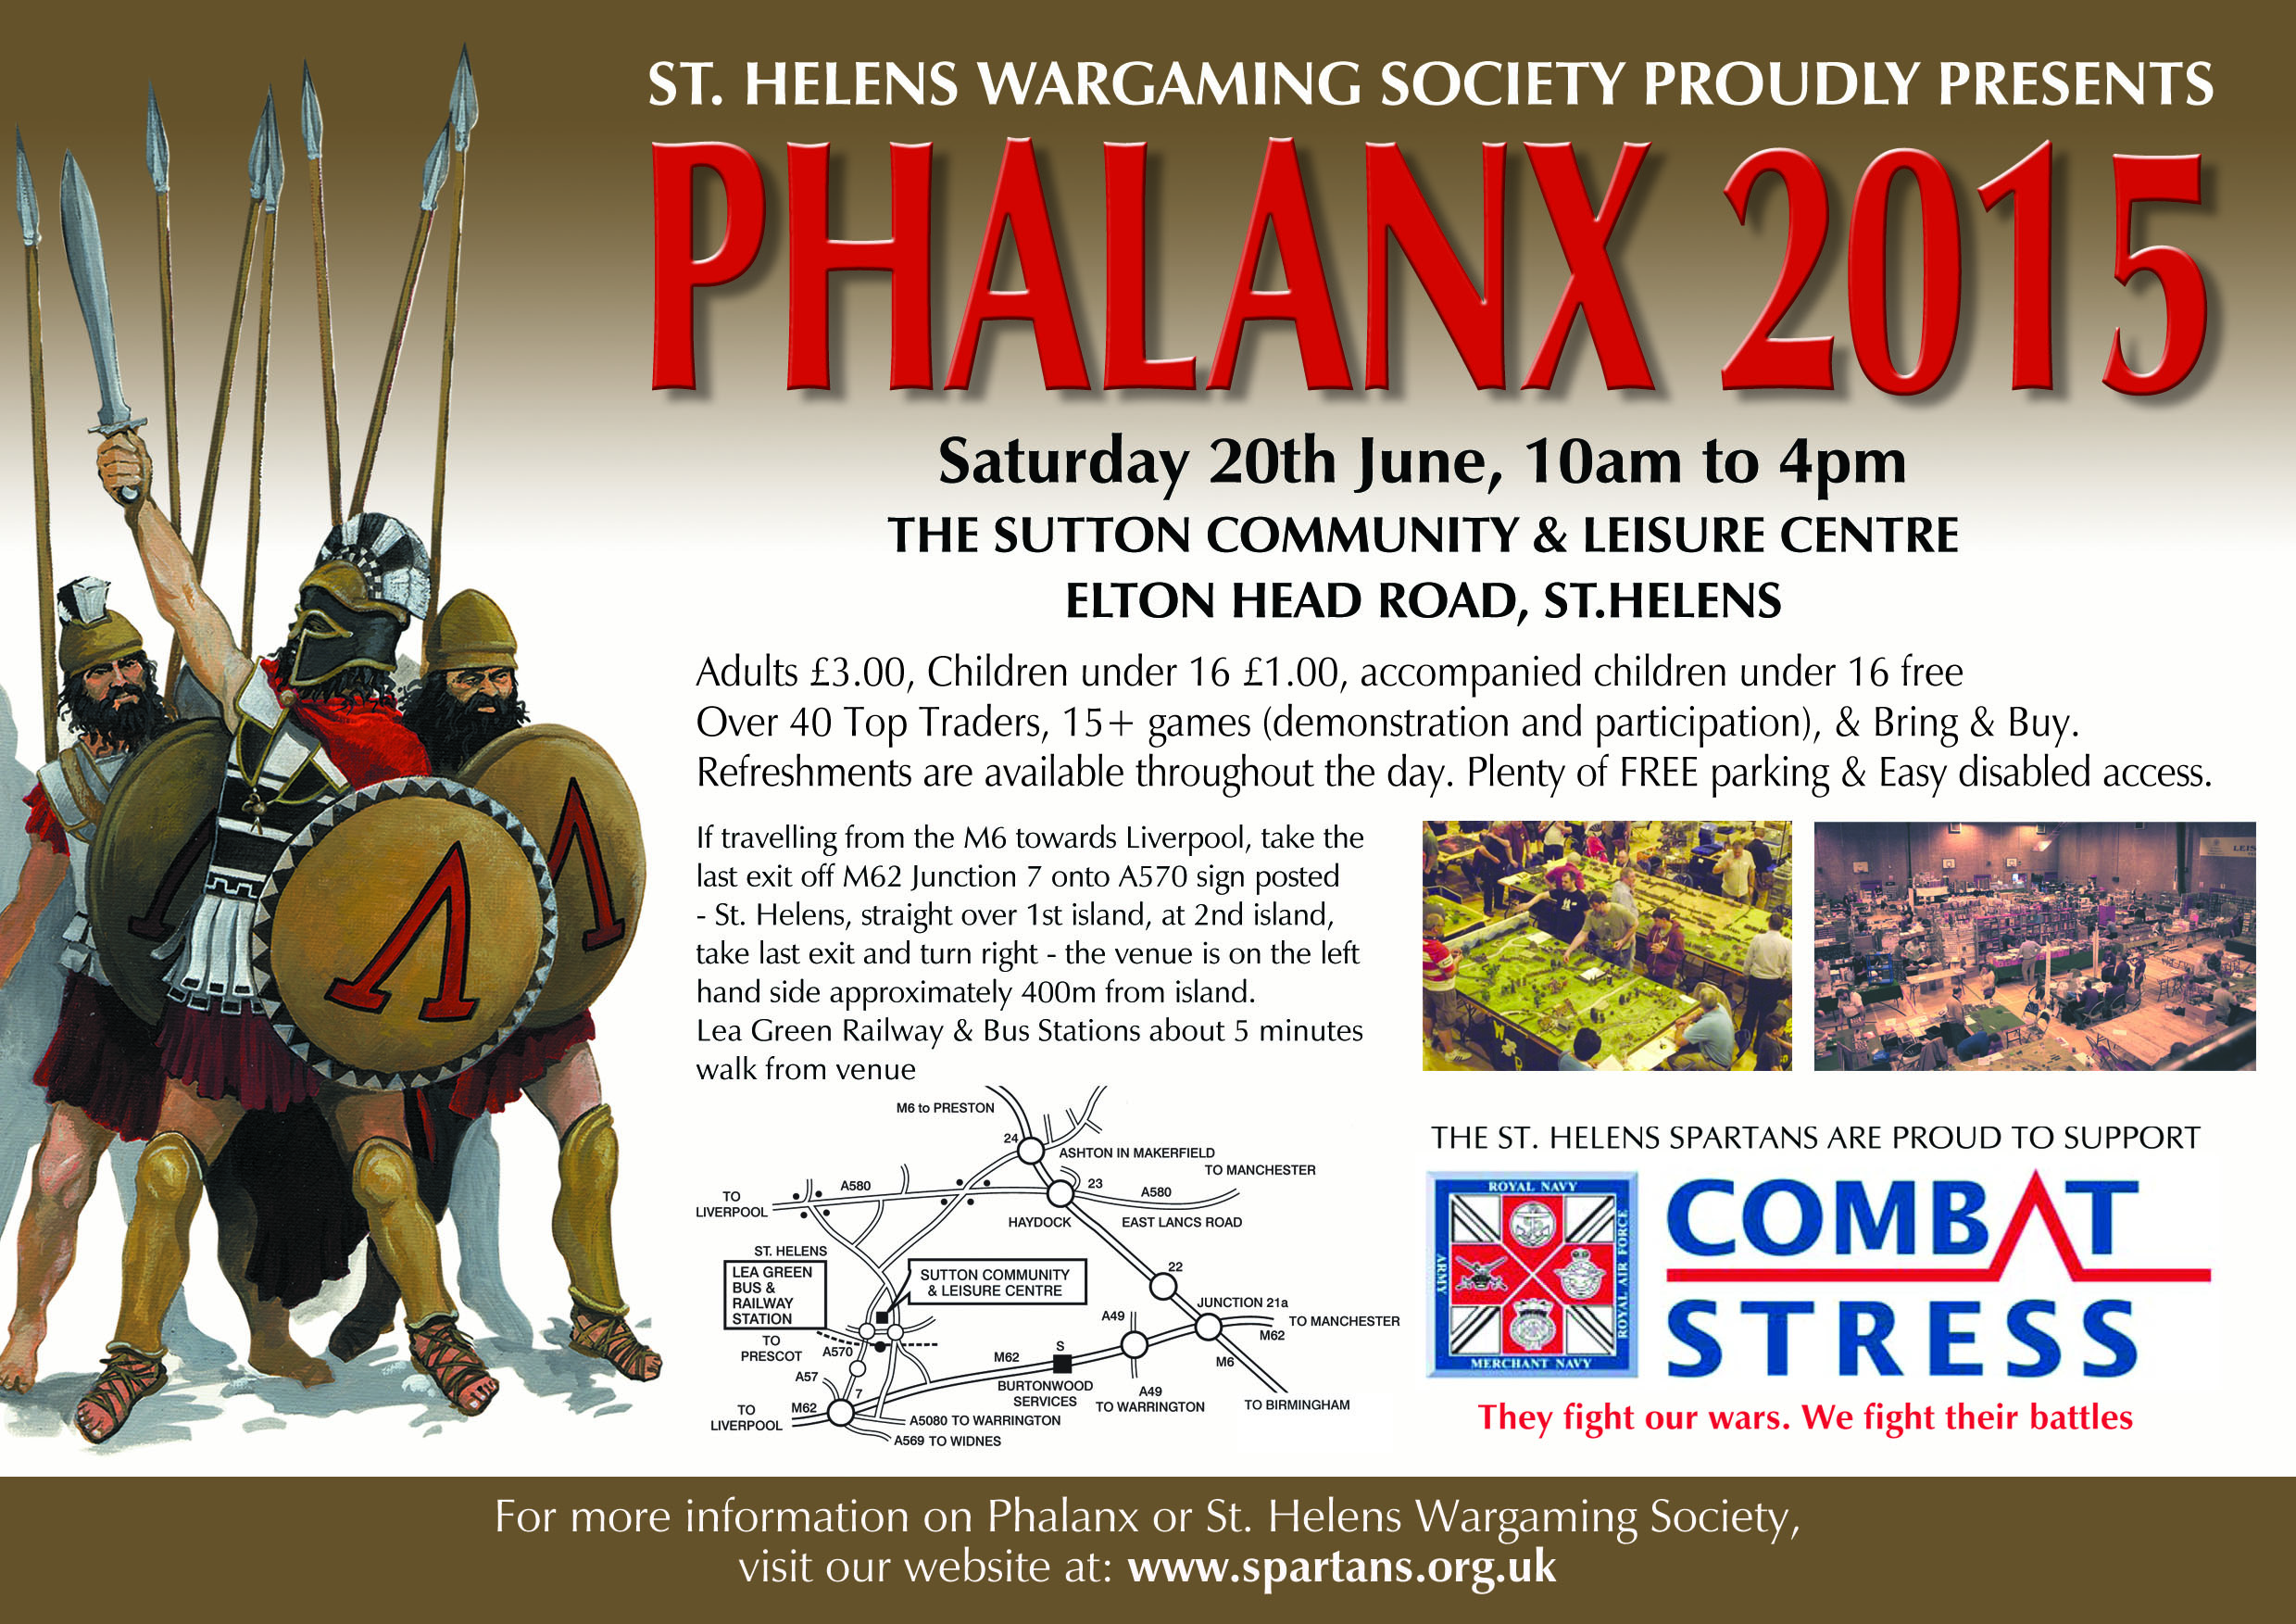 Phalanx 2015